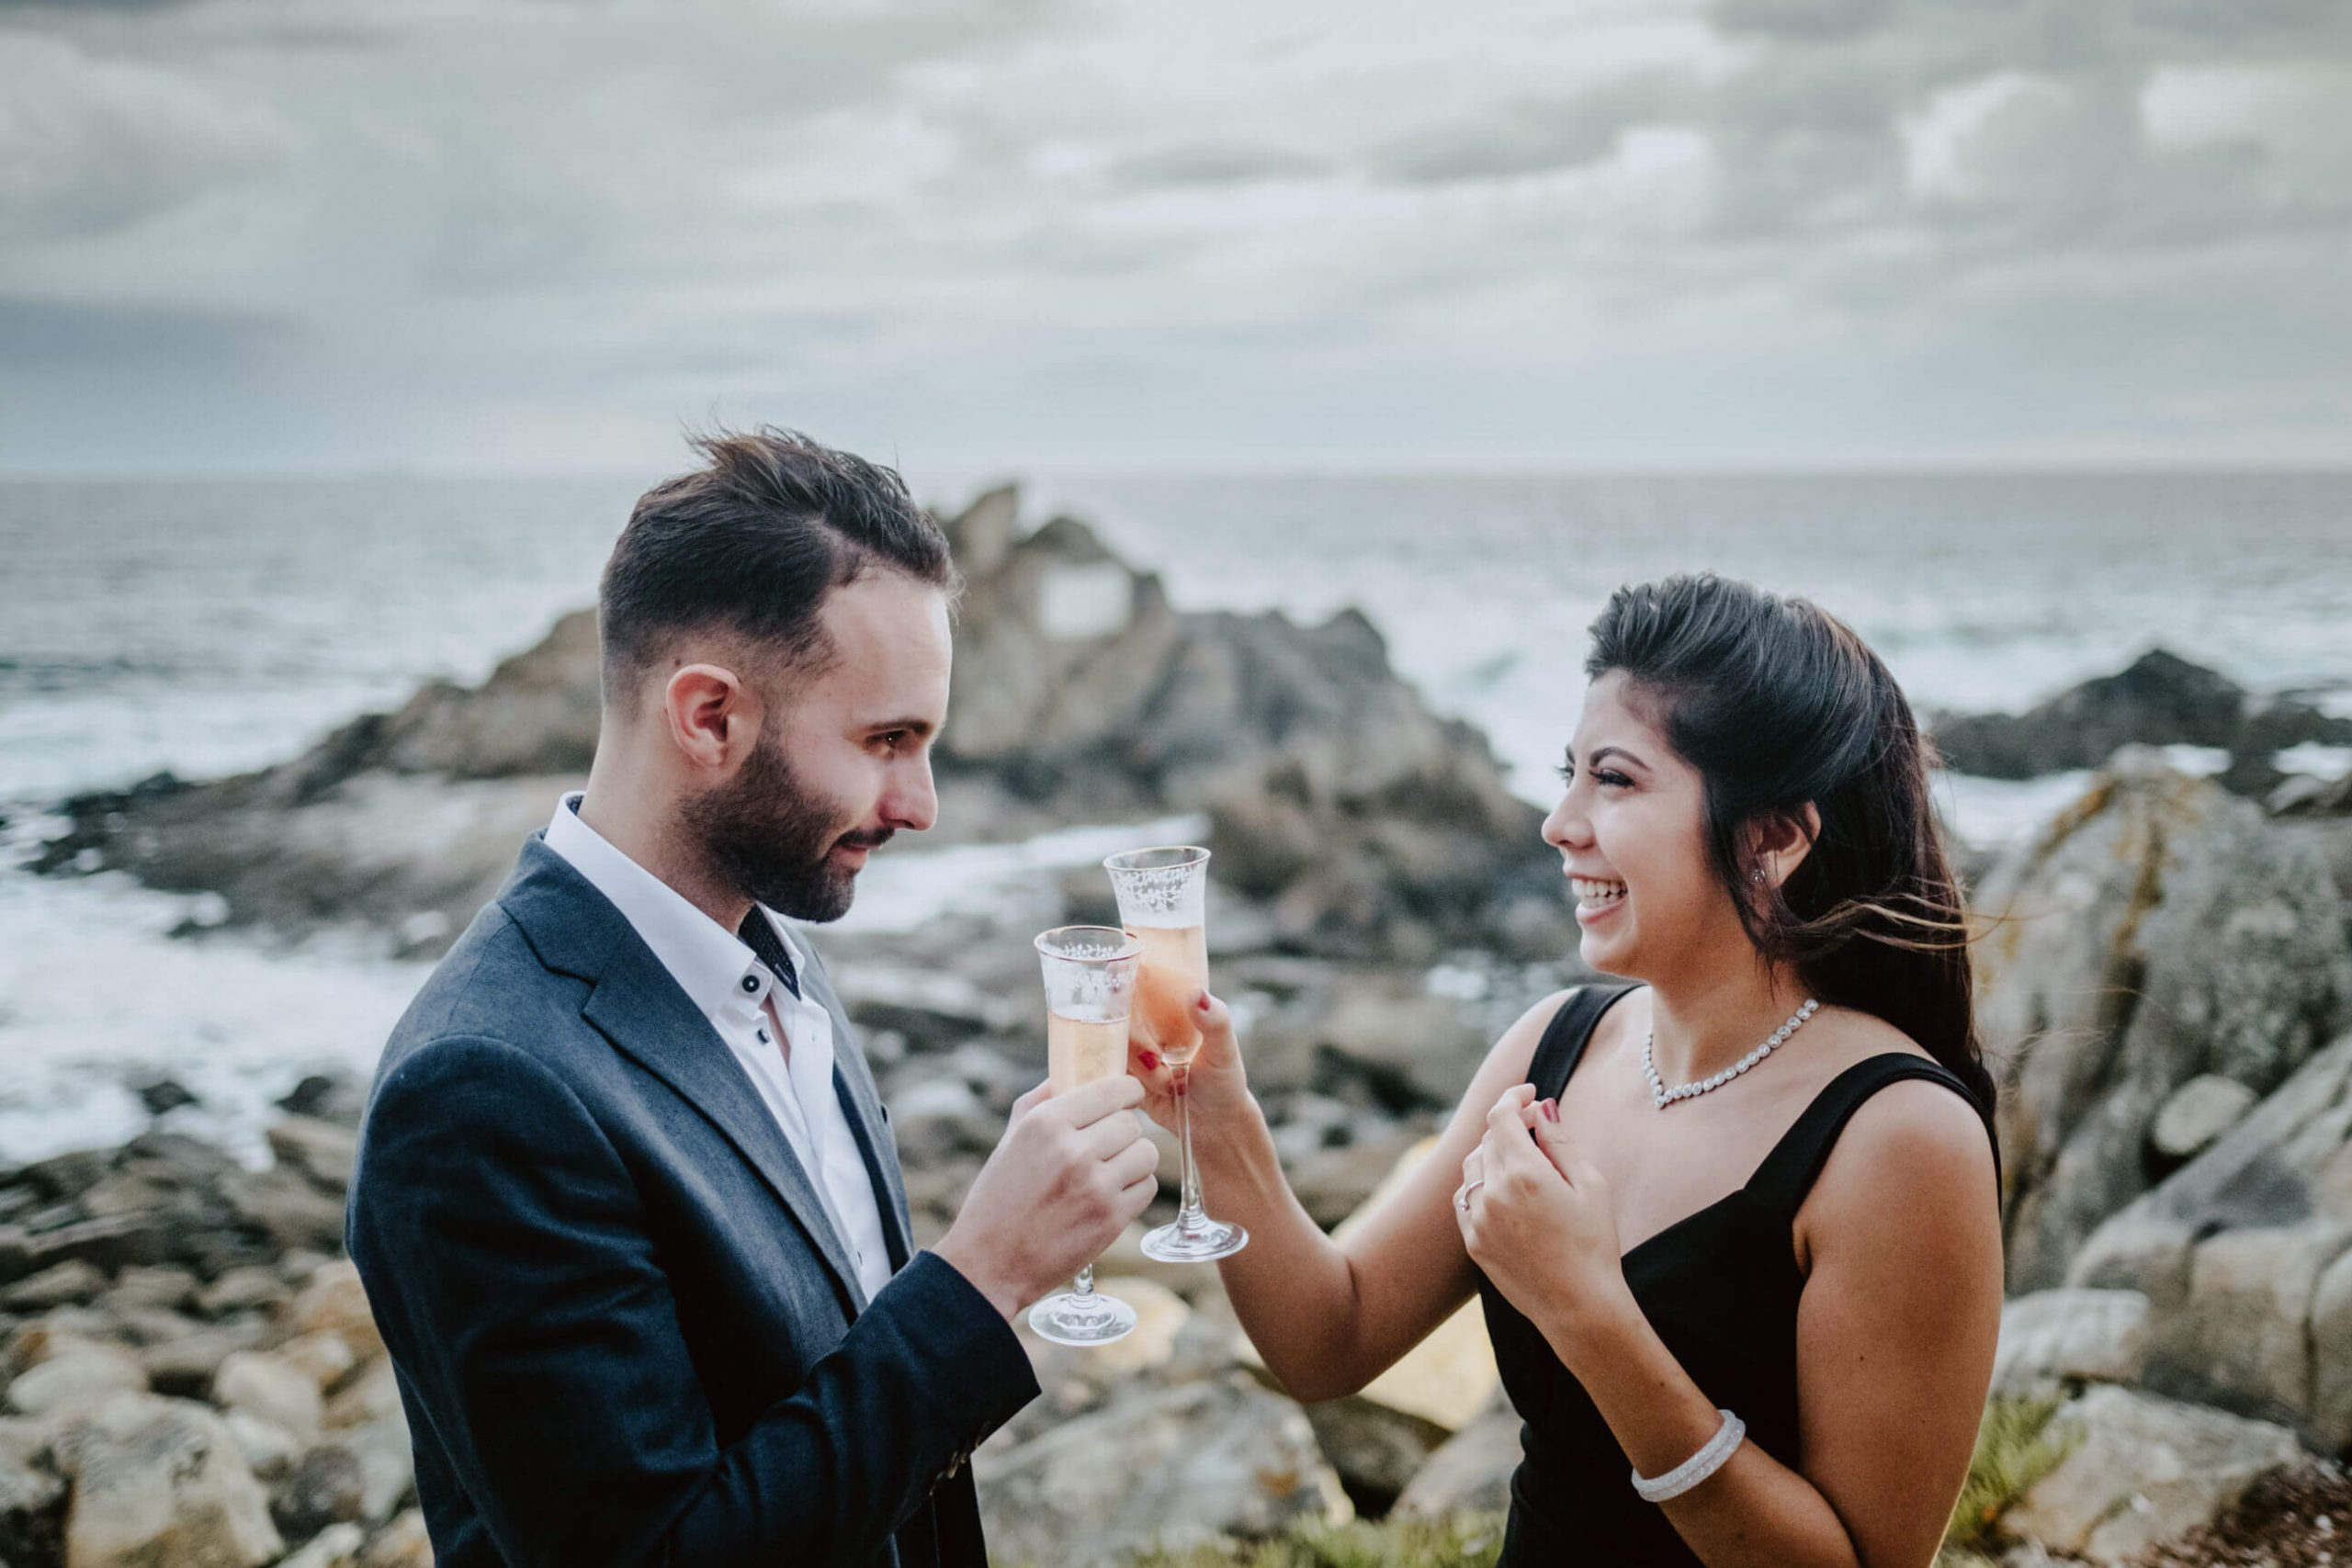 roma-organizacao-eventos-pedido-casamento-casa-de-cha-da-boa-nova-porto-portugal-18